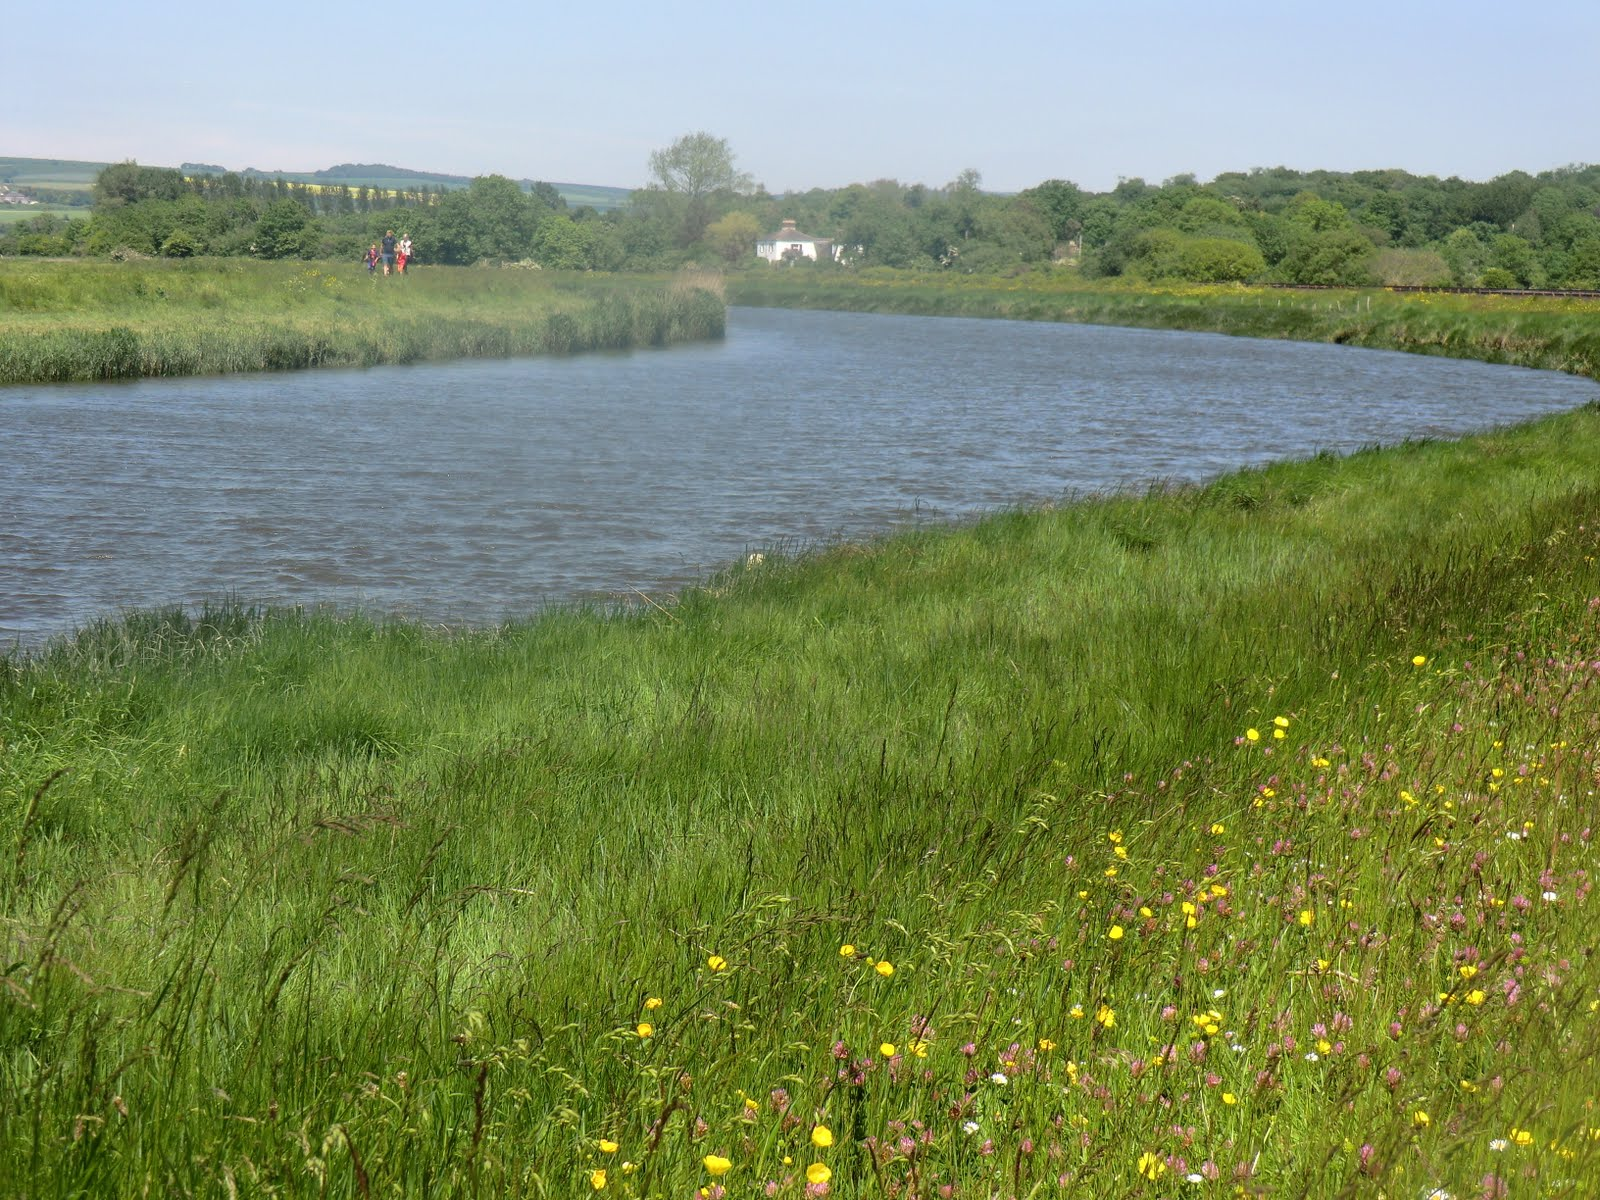 CIMG7301 River Arun near Arundel